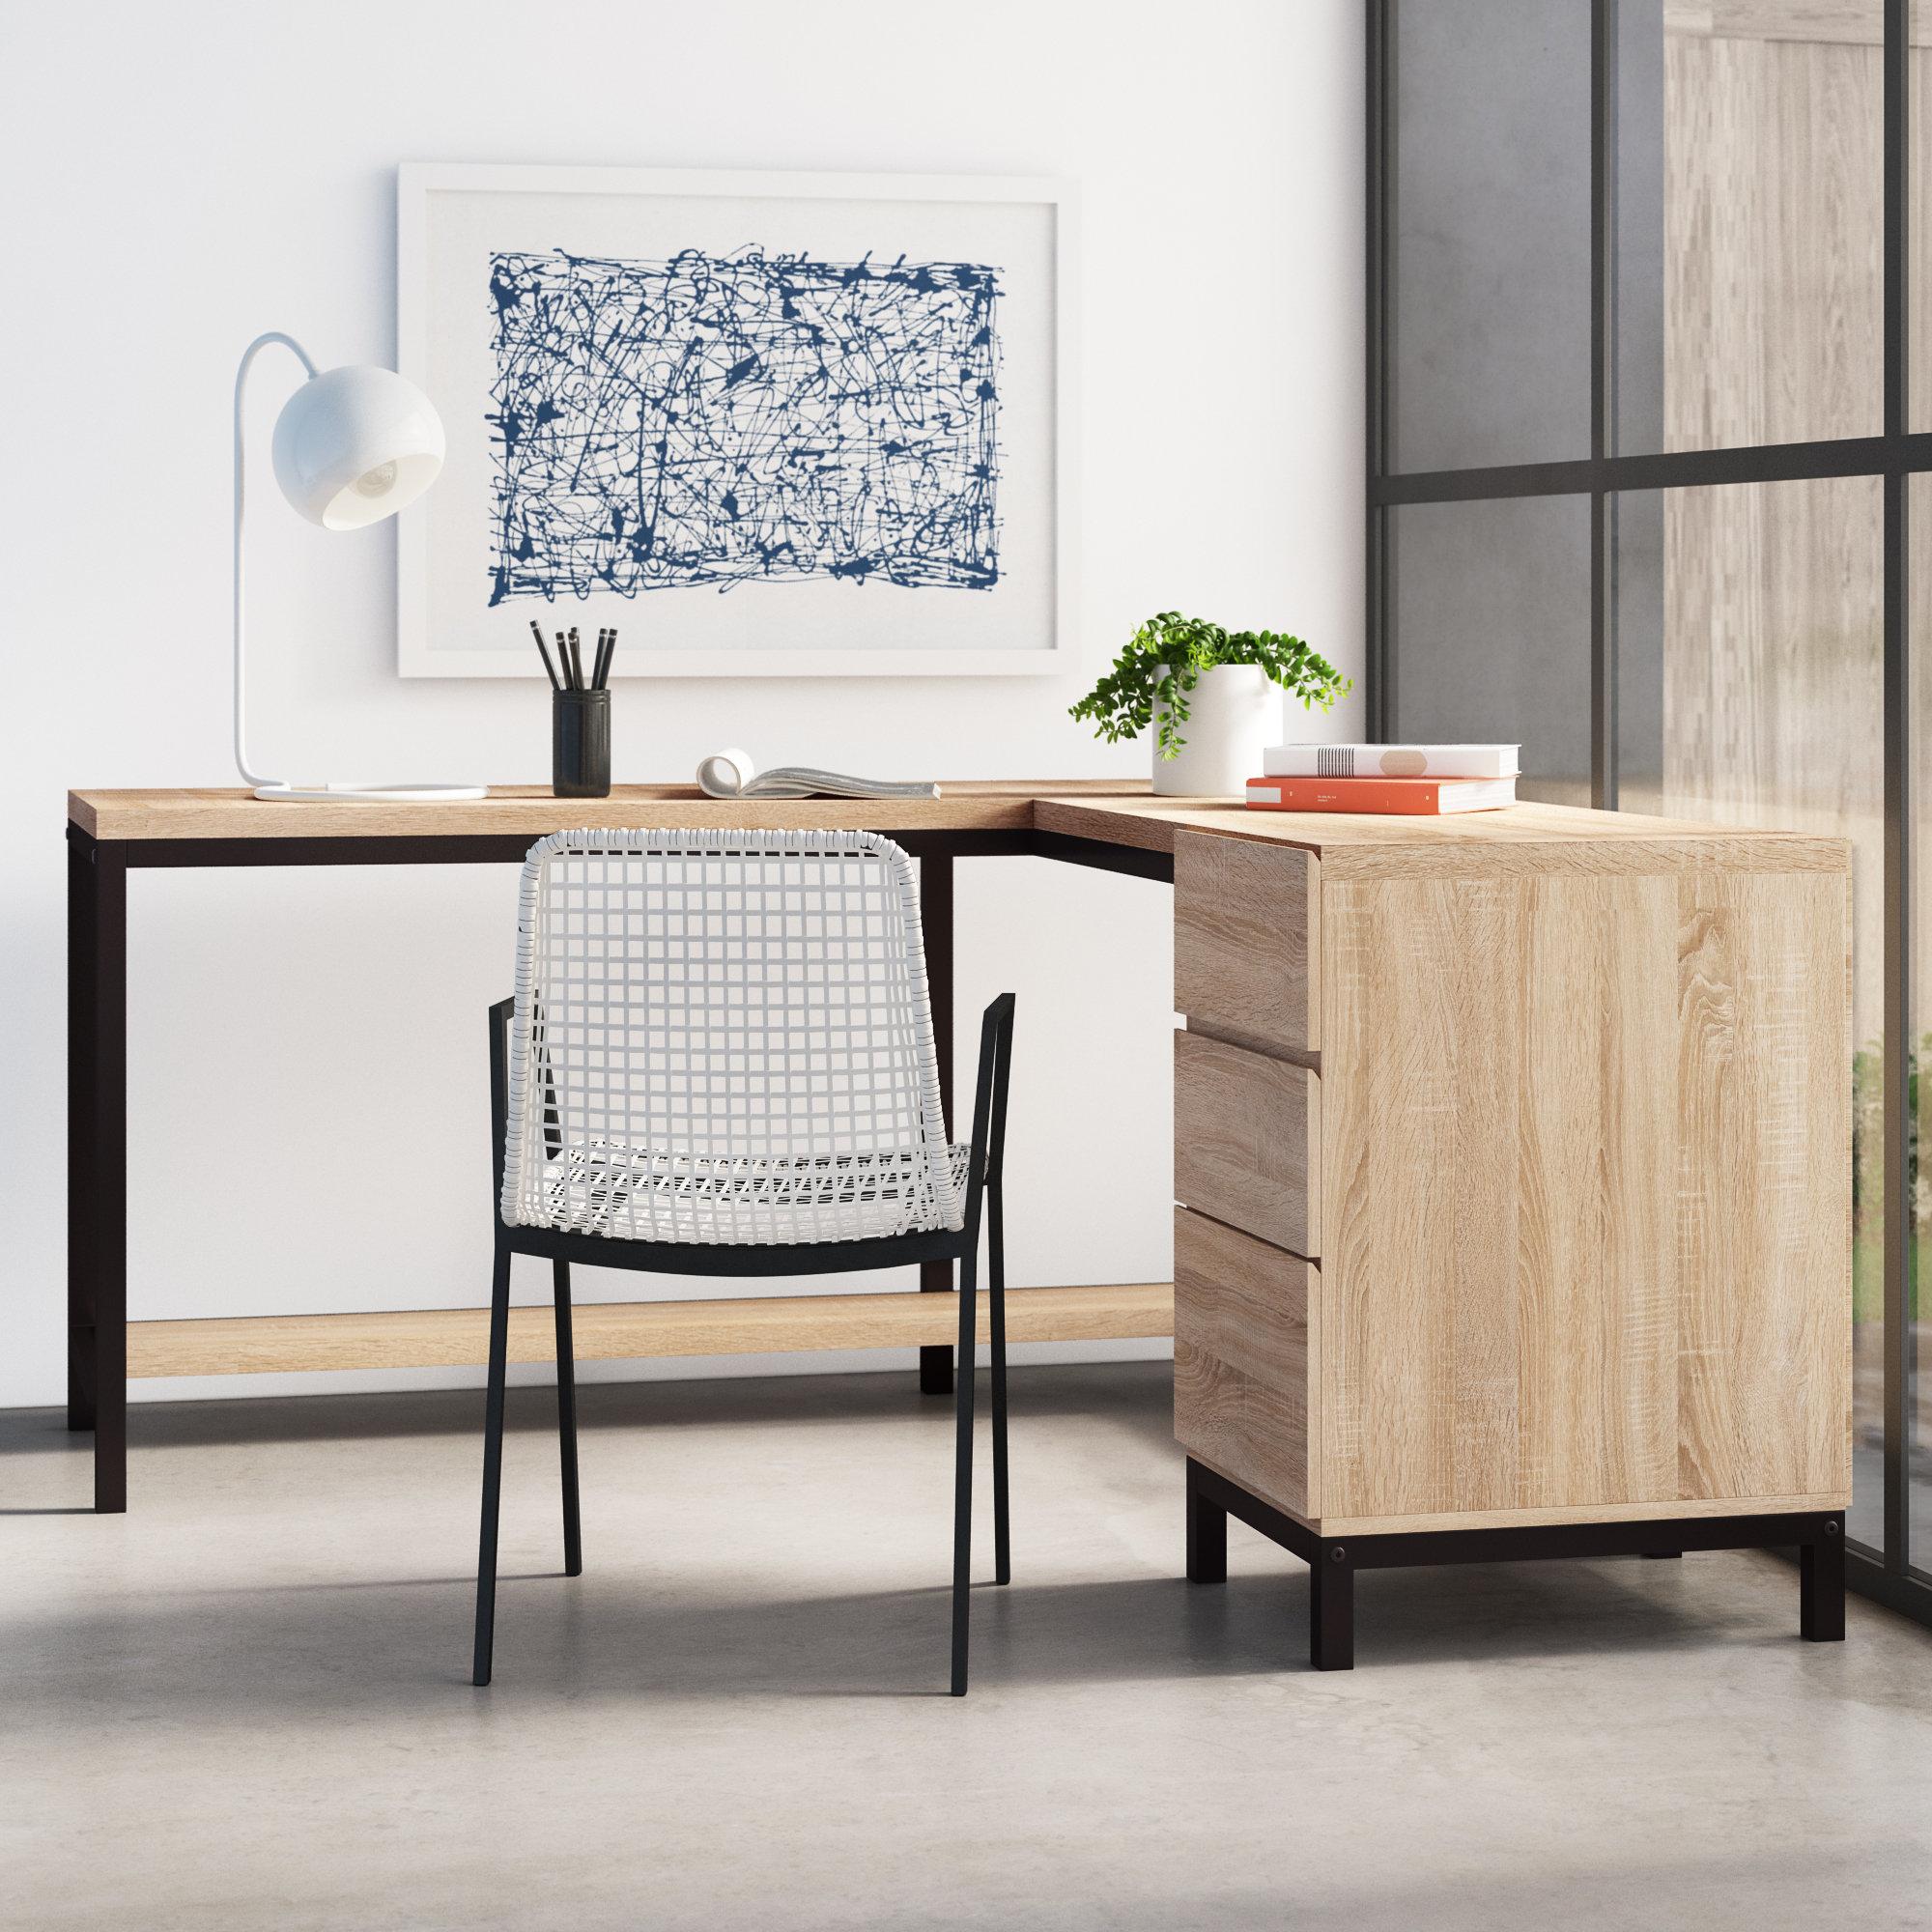 Picture of: Allmodern Desks You Ll Love In 2020 Wayfair